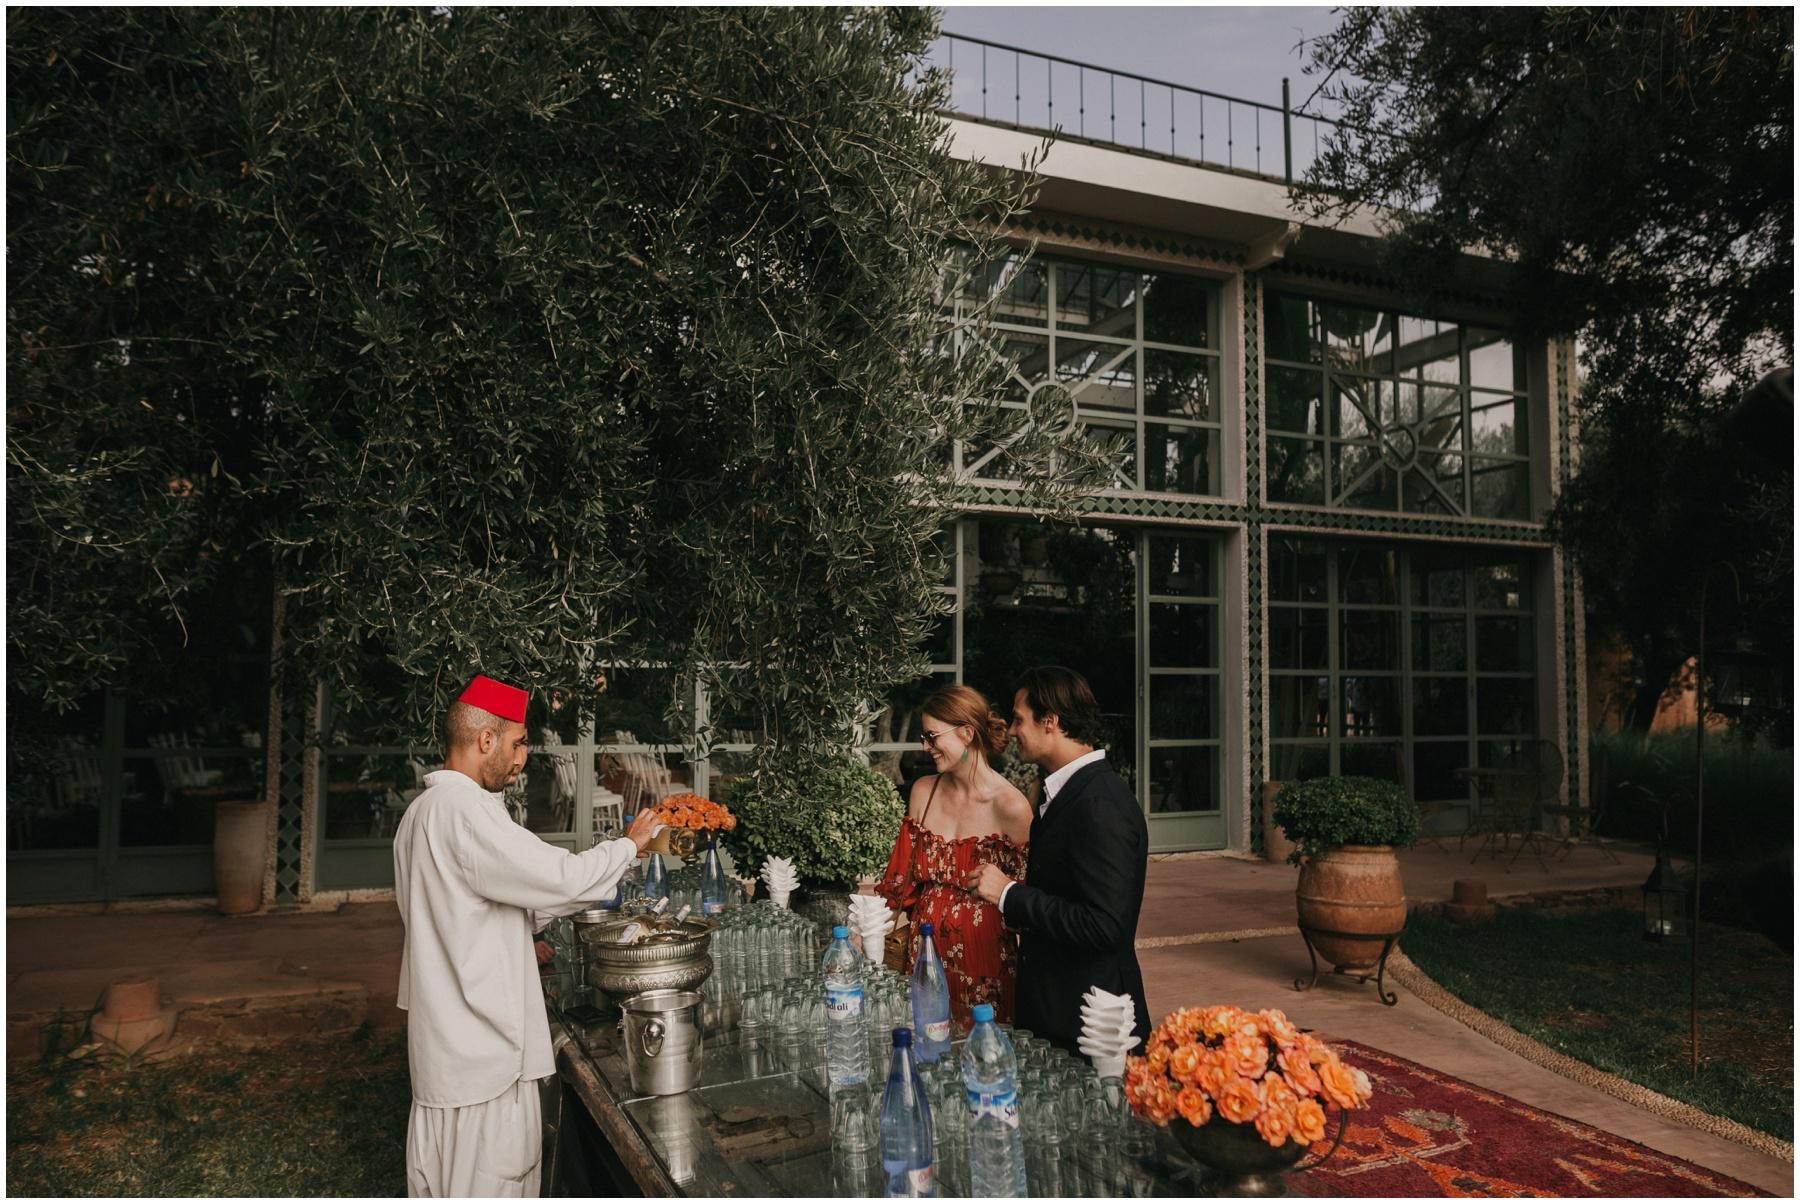 Marrakech Wedding Beldi Coutry Club 019.JPG